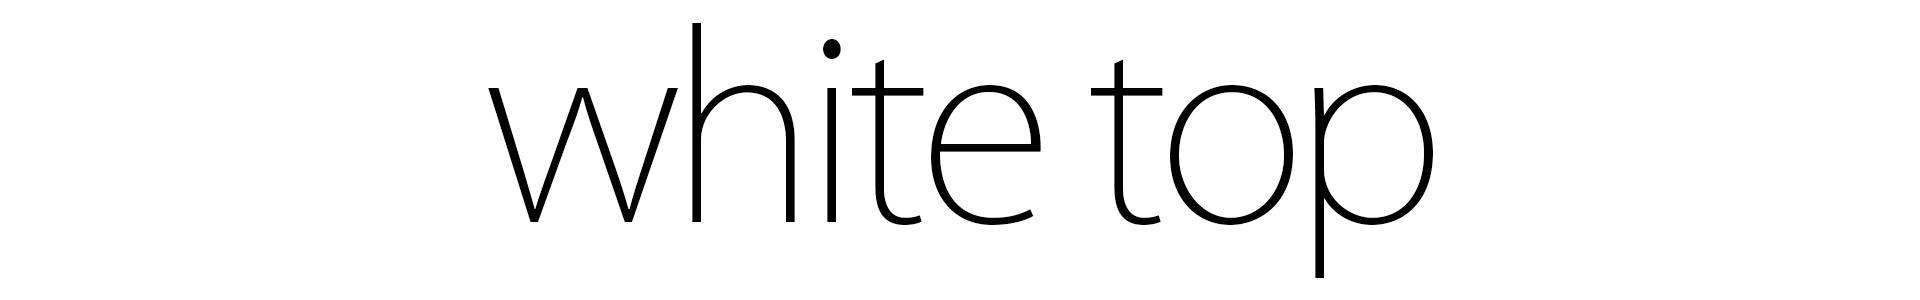 ProductSlider-WhiteTop1